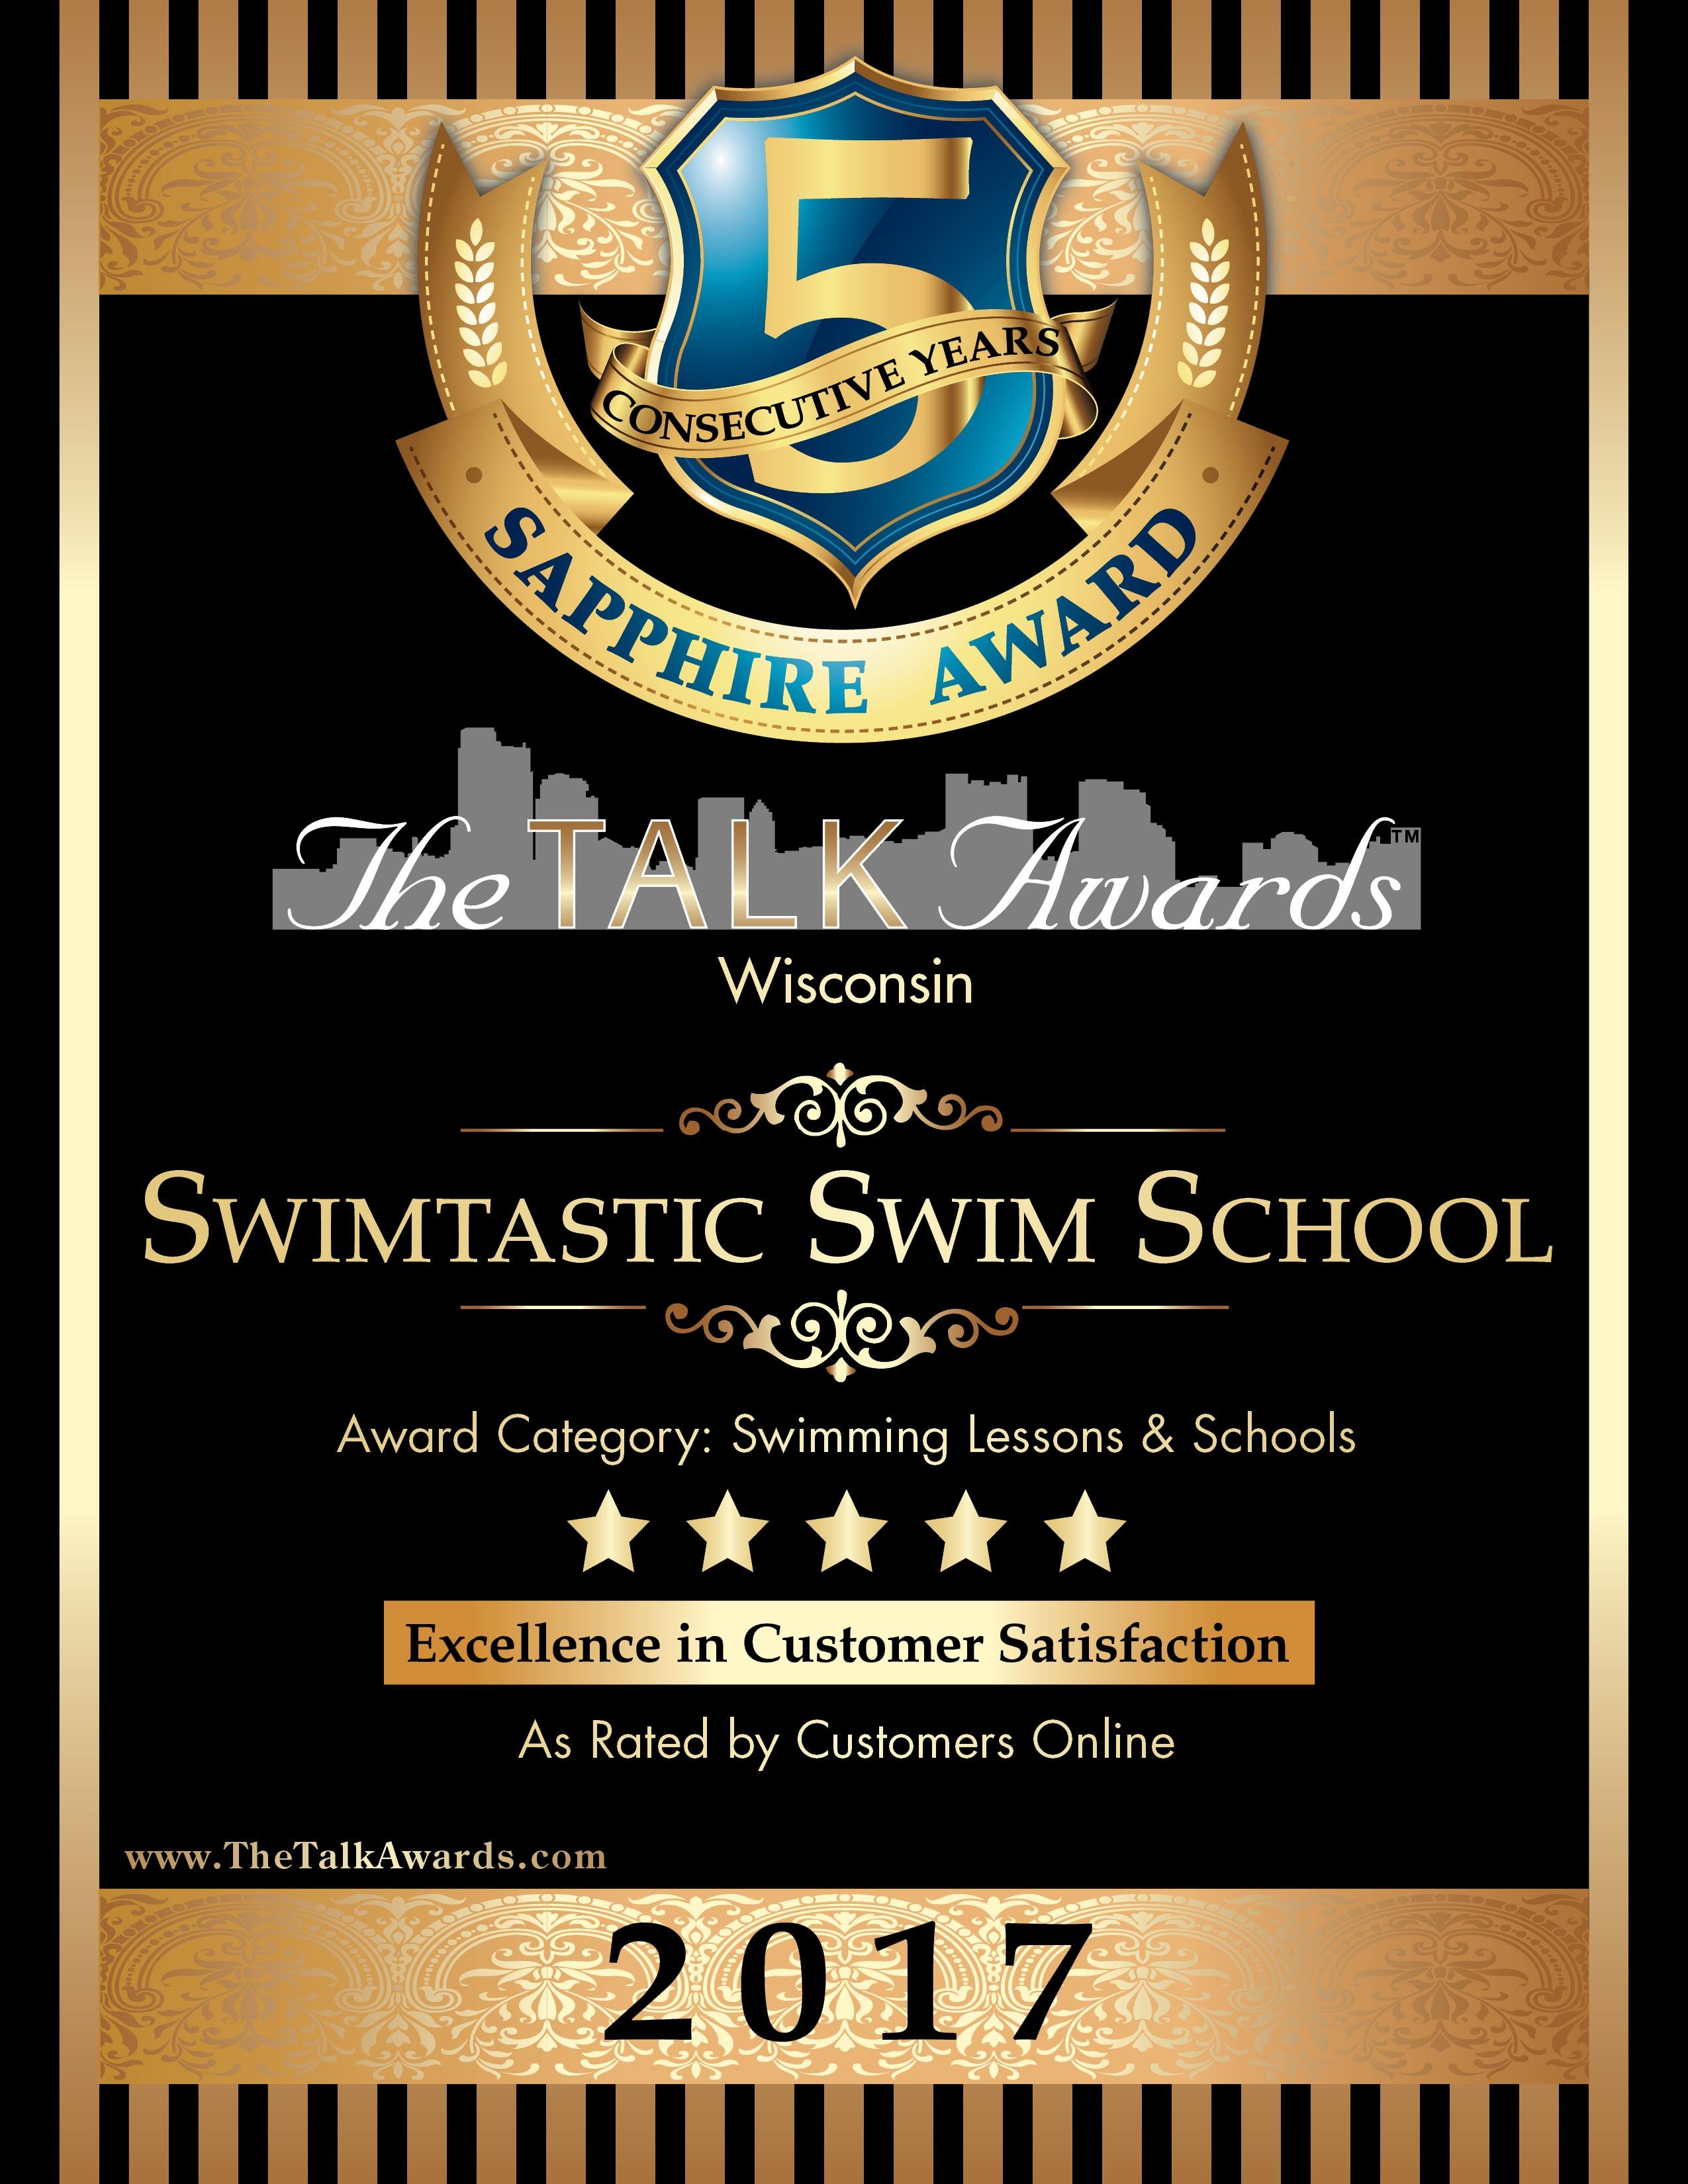 Talk_Swimtastic Swim School_17Silver_5year_20170906 (002).jpg